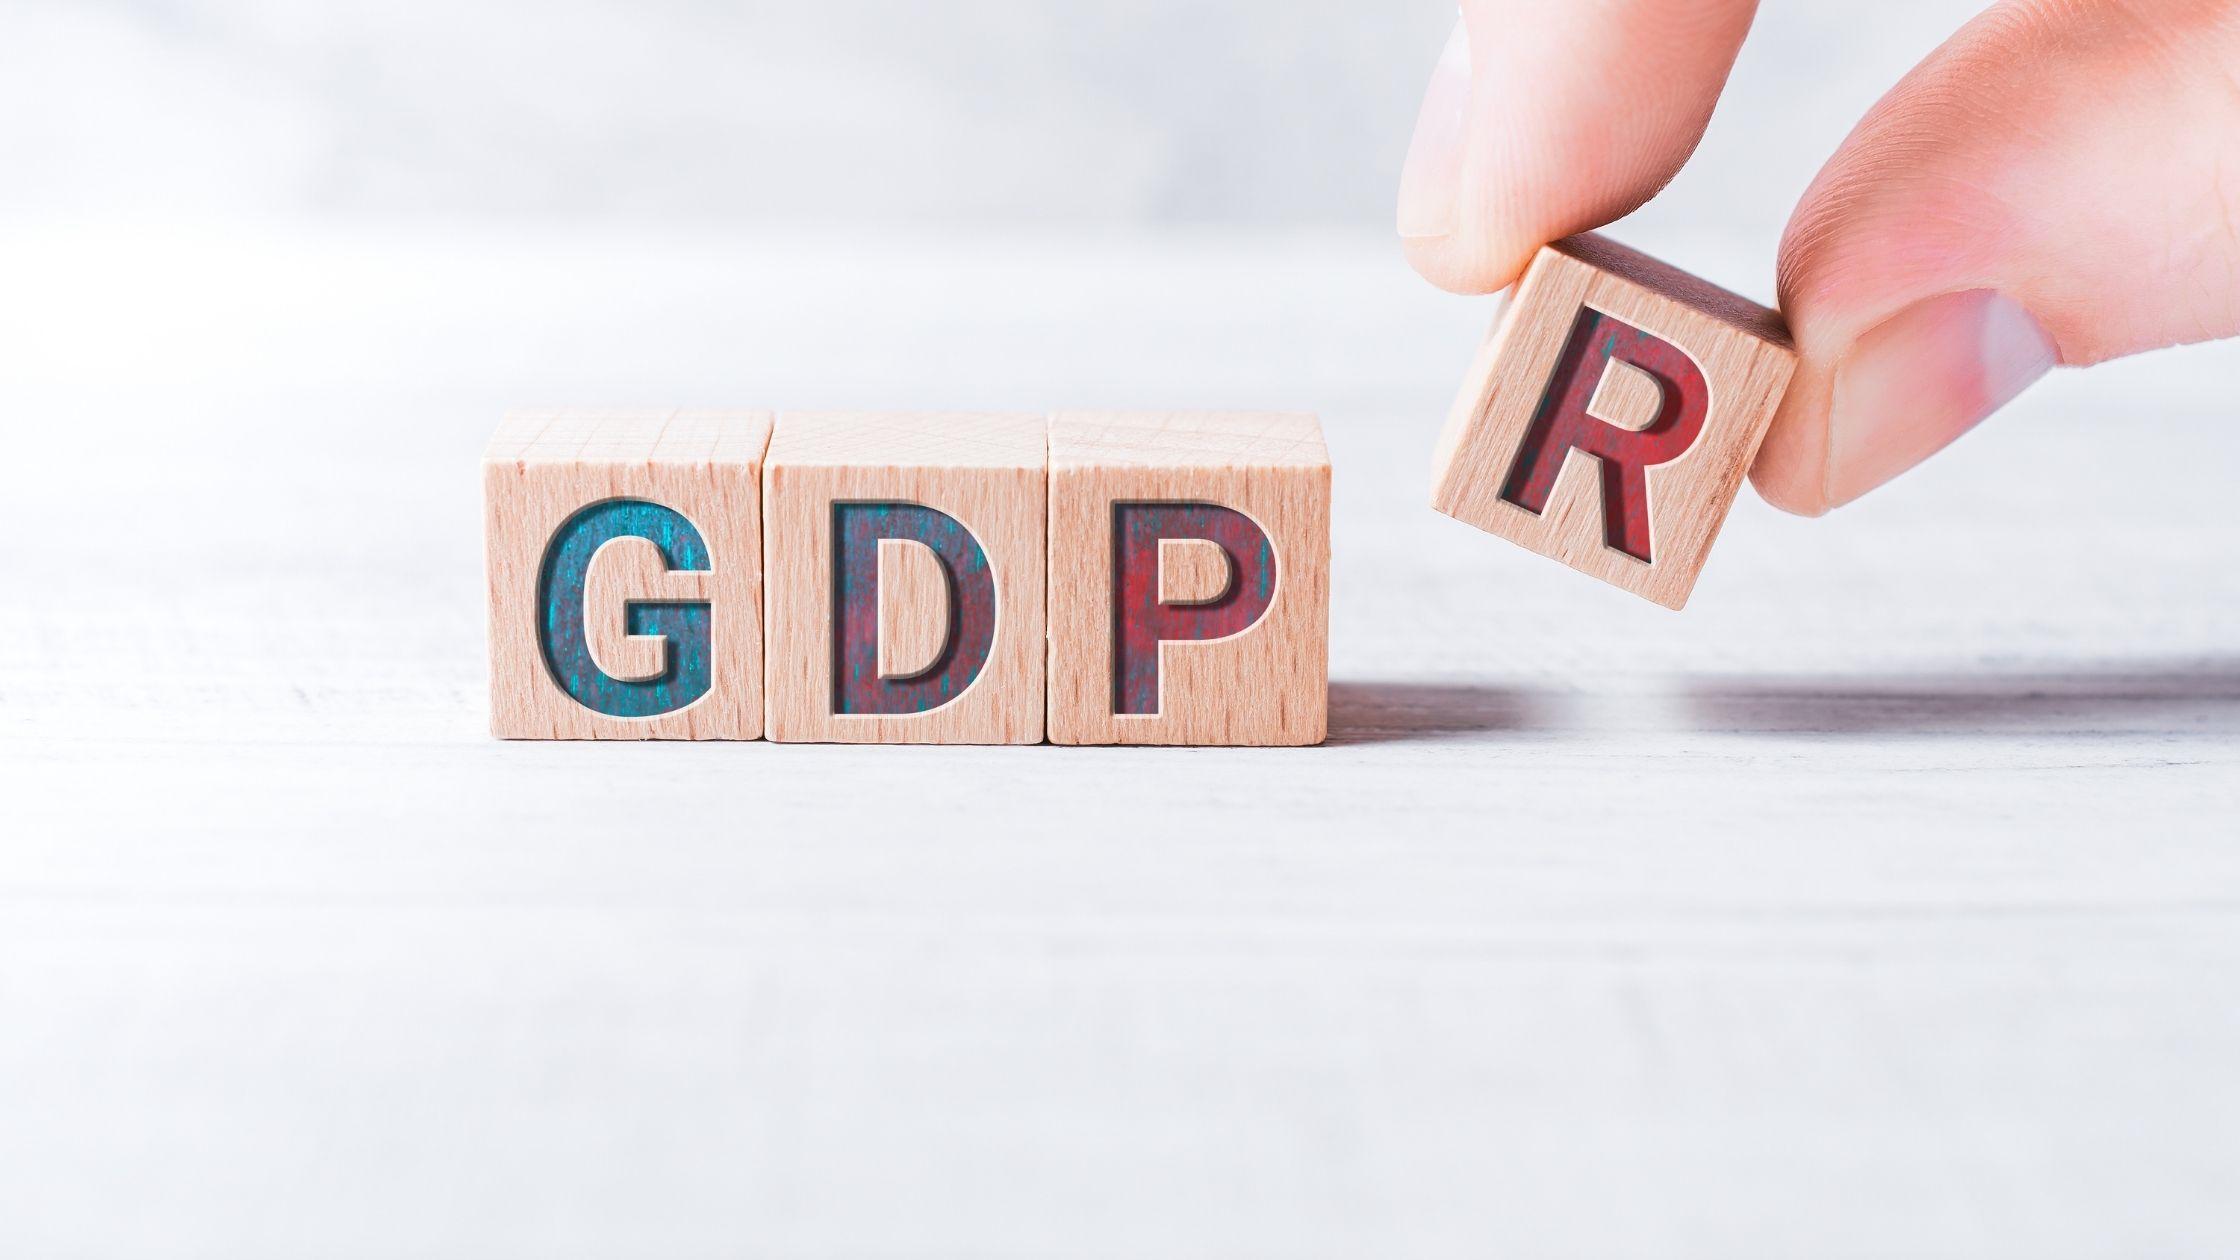 RTBF and GDPR